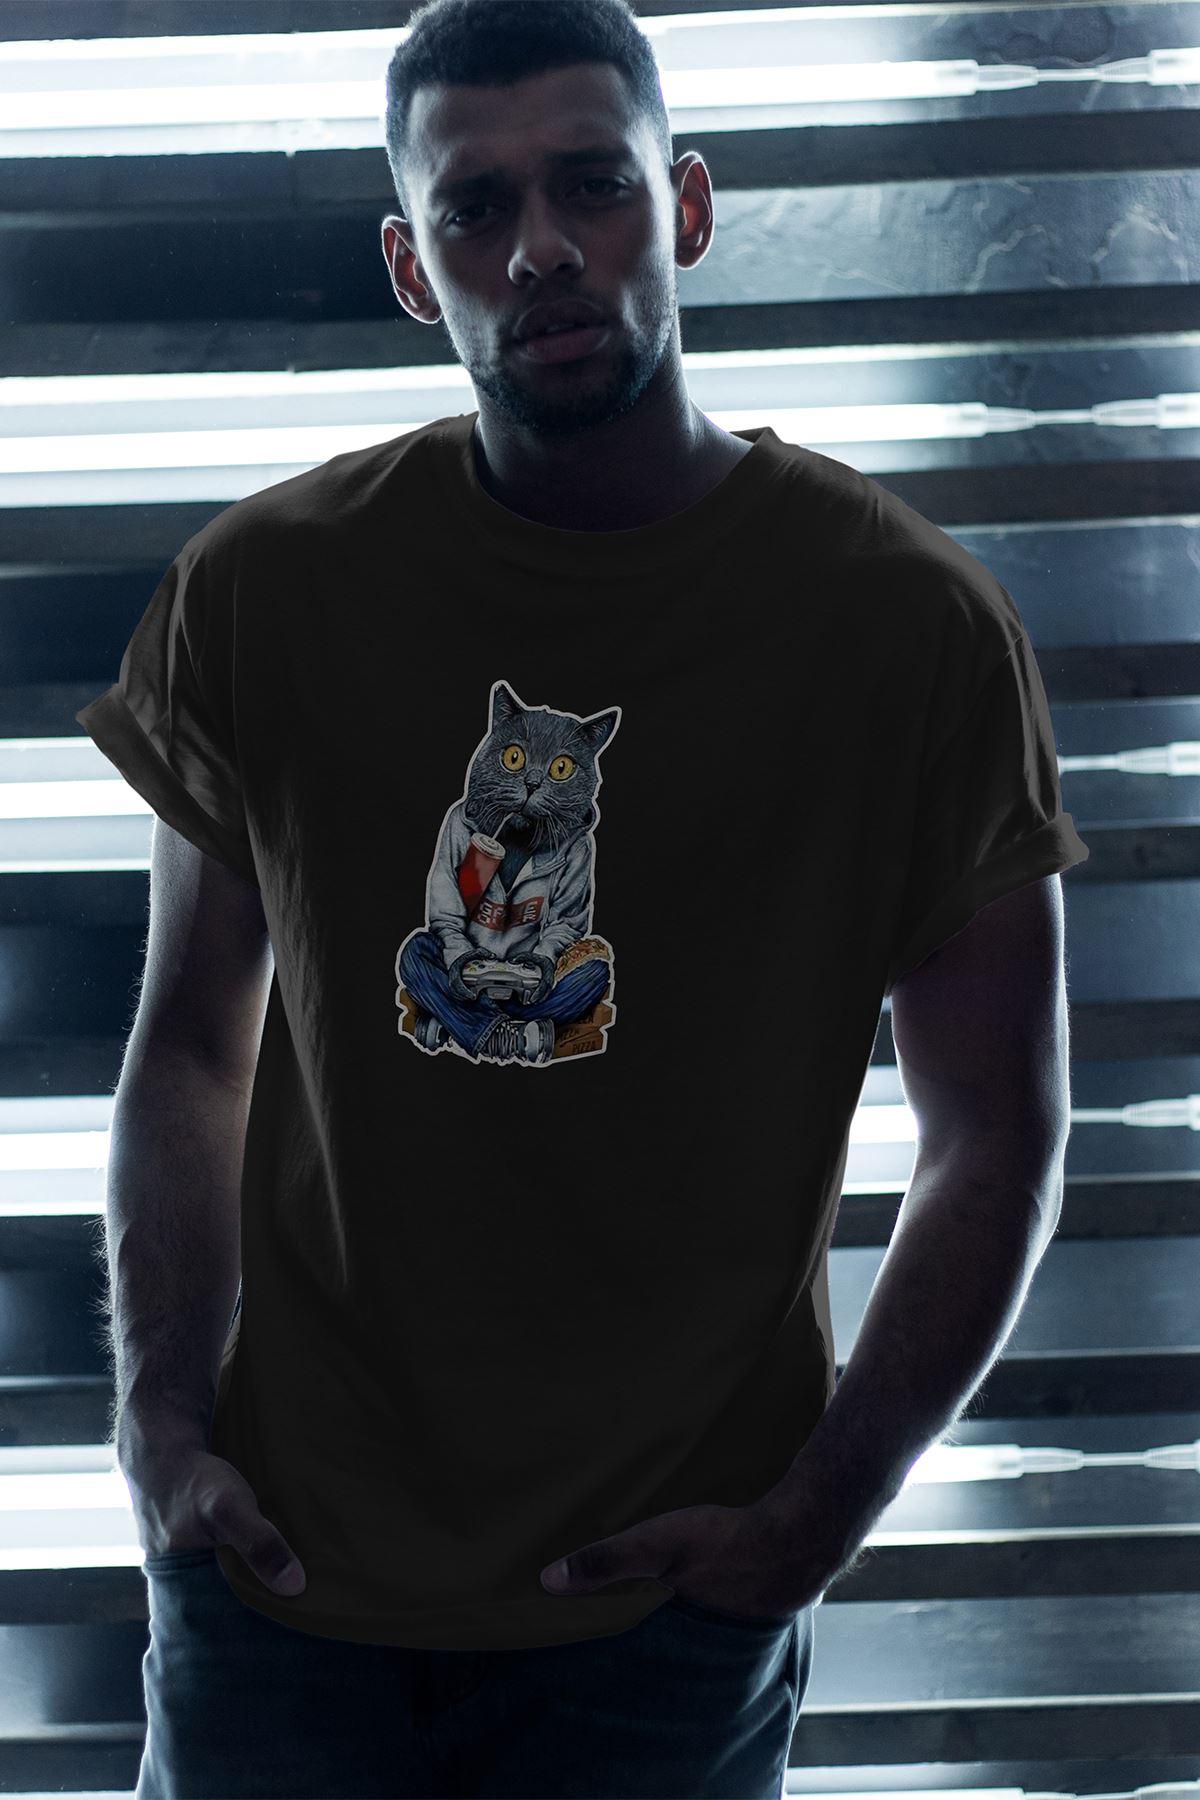 Kedi Siyah Erkek Oversize Tshirt - Tişört